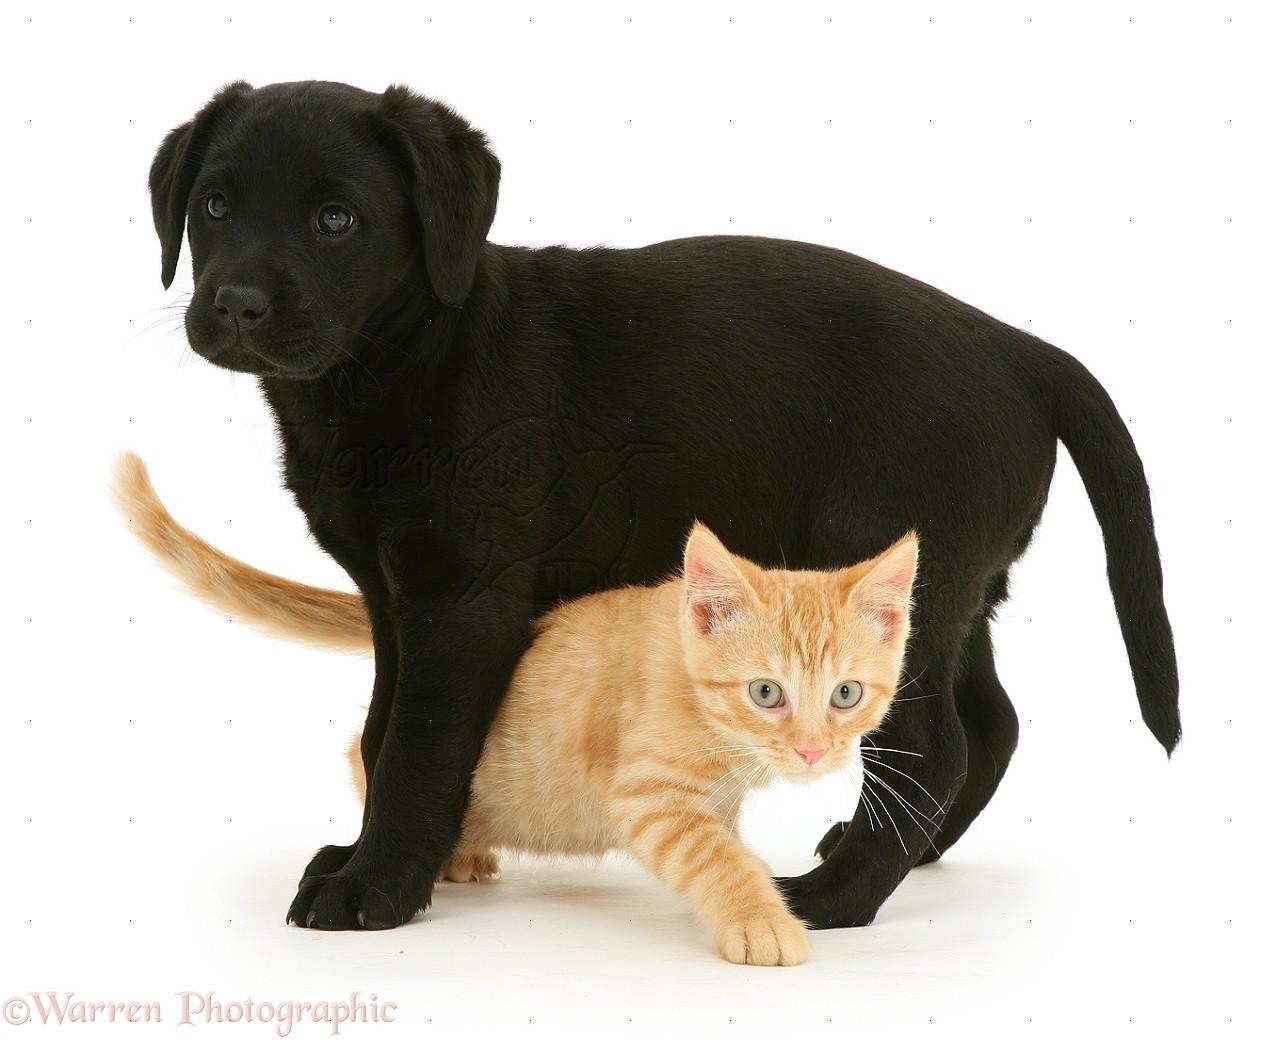 White Ginger Black Cat Together